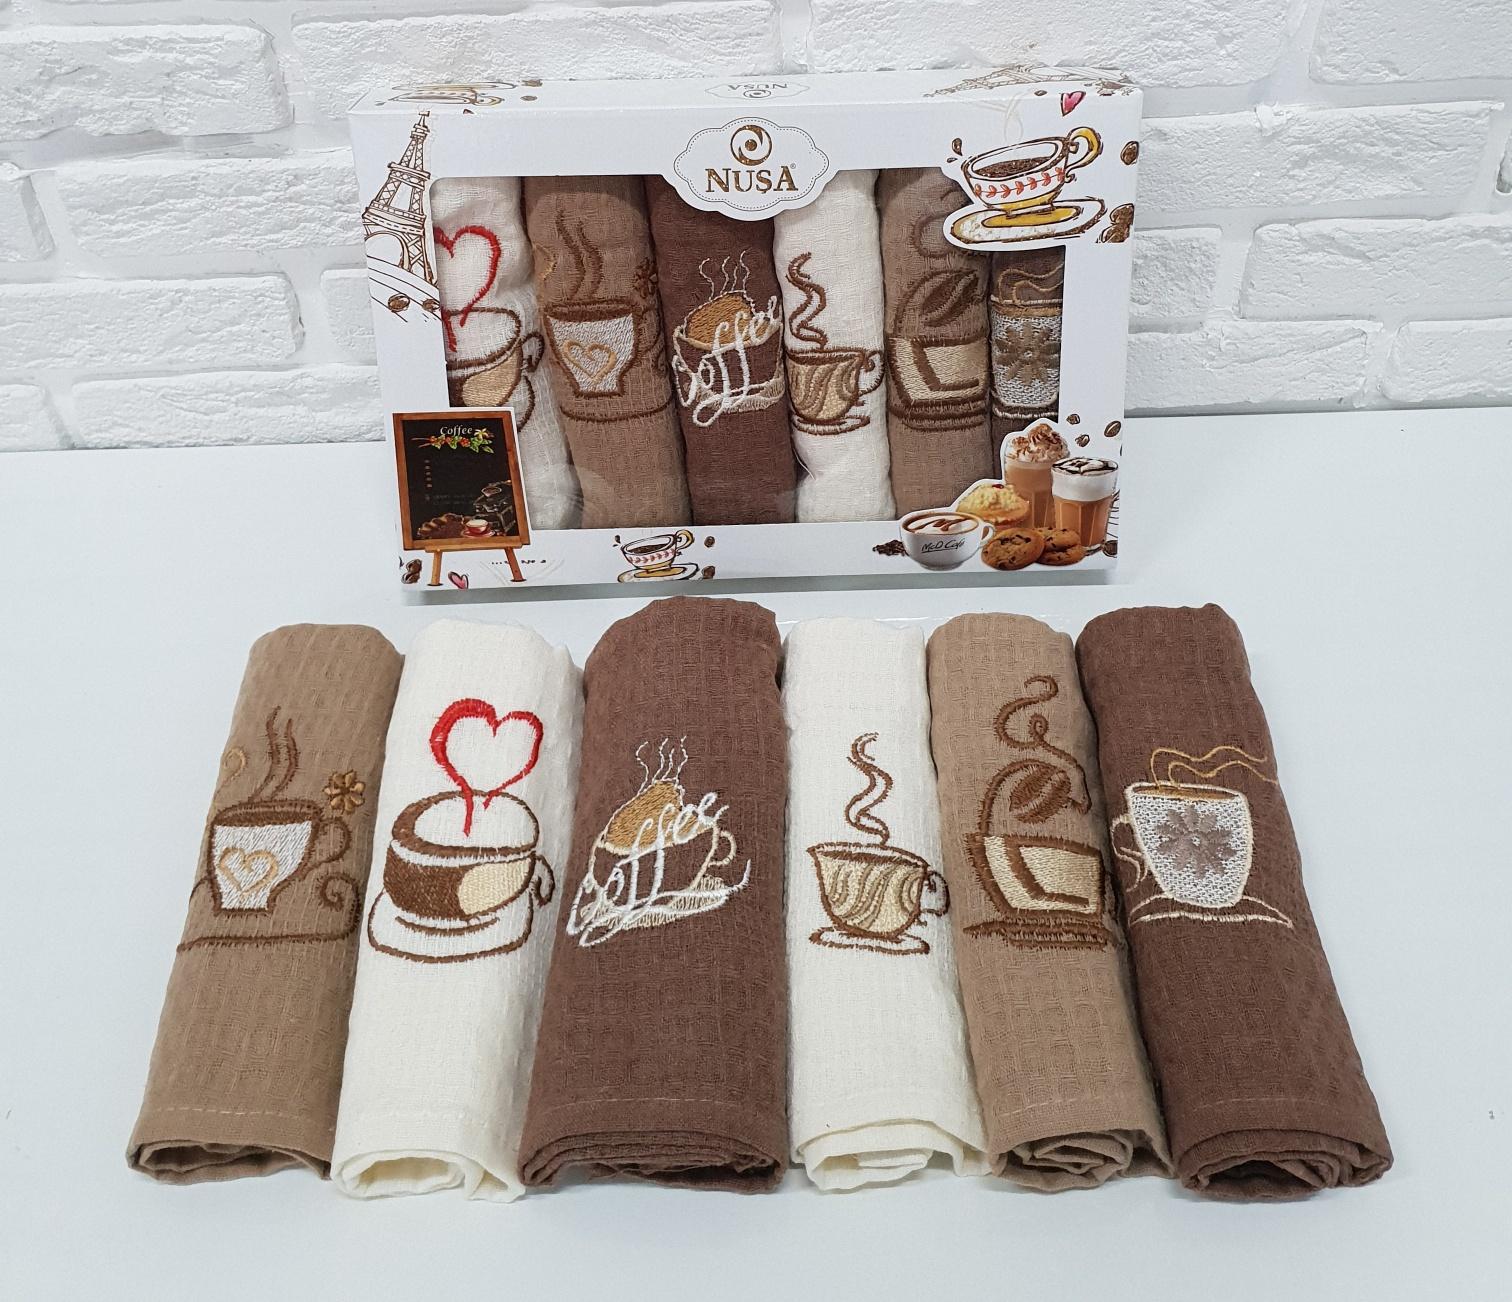 Купить Полотенца Nusa, Кухонное полотенце Кофе (40х60 см - 6 шт), Турция, Вафля